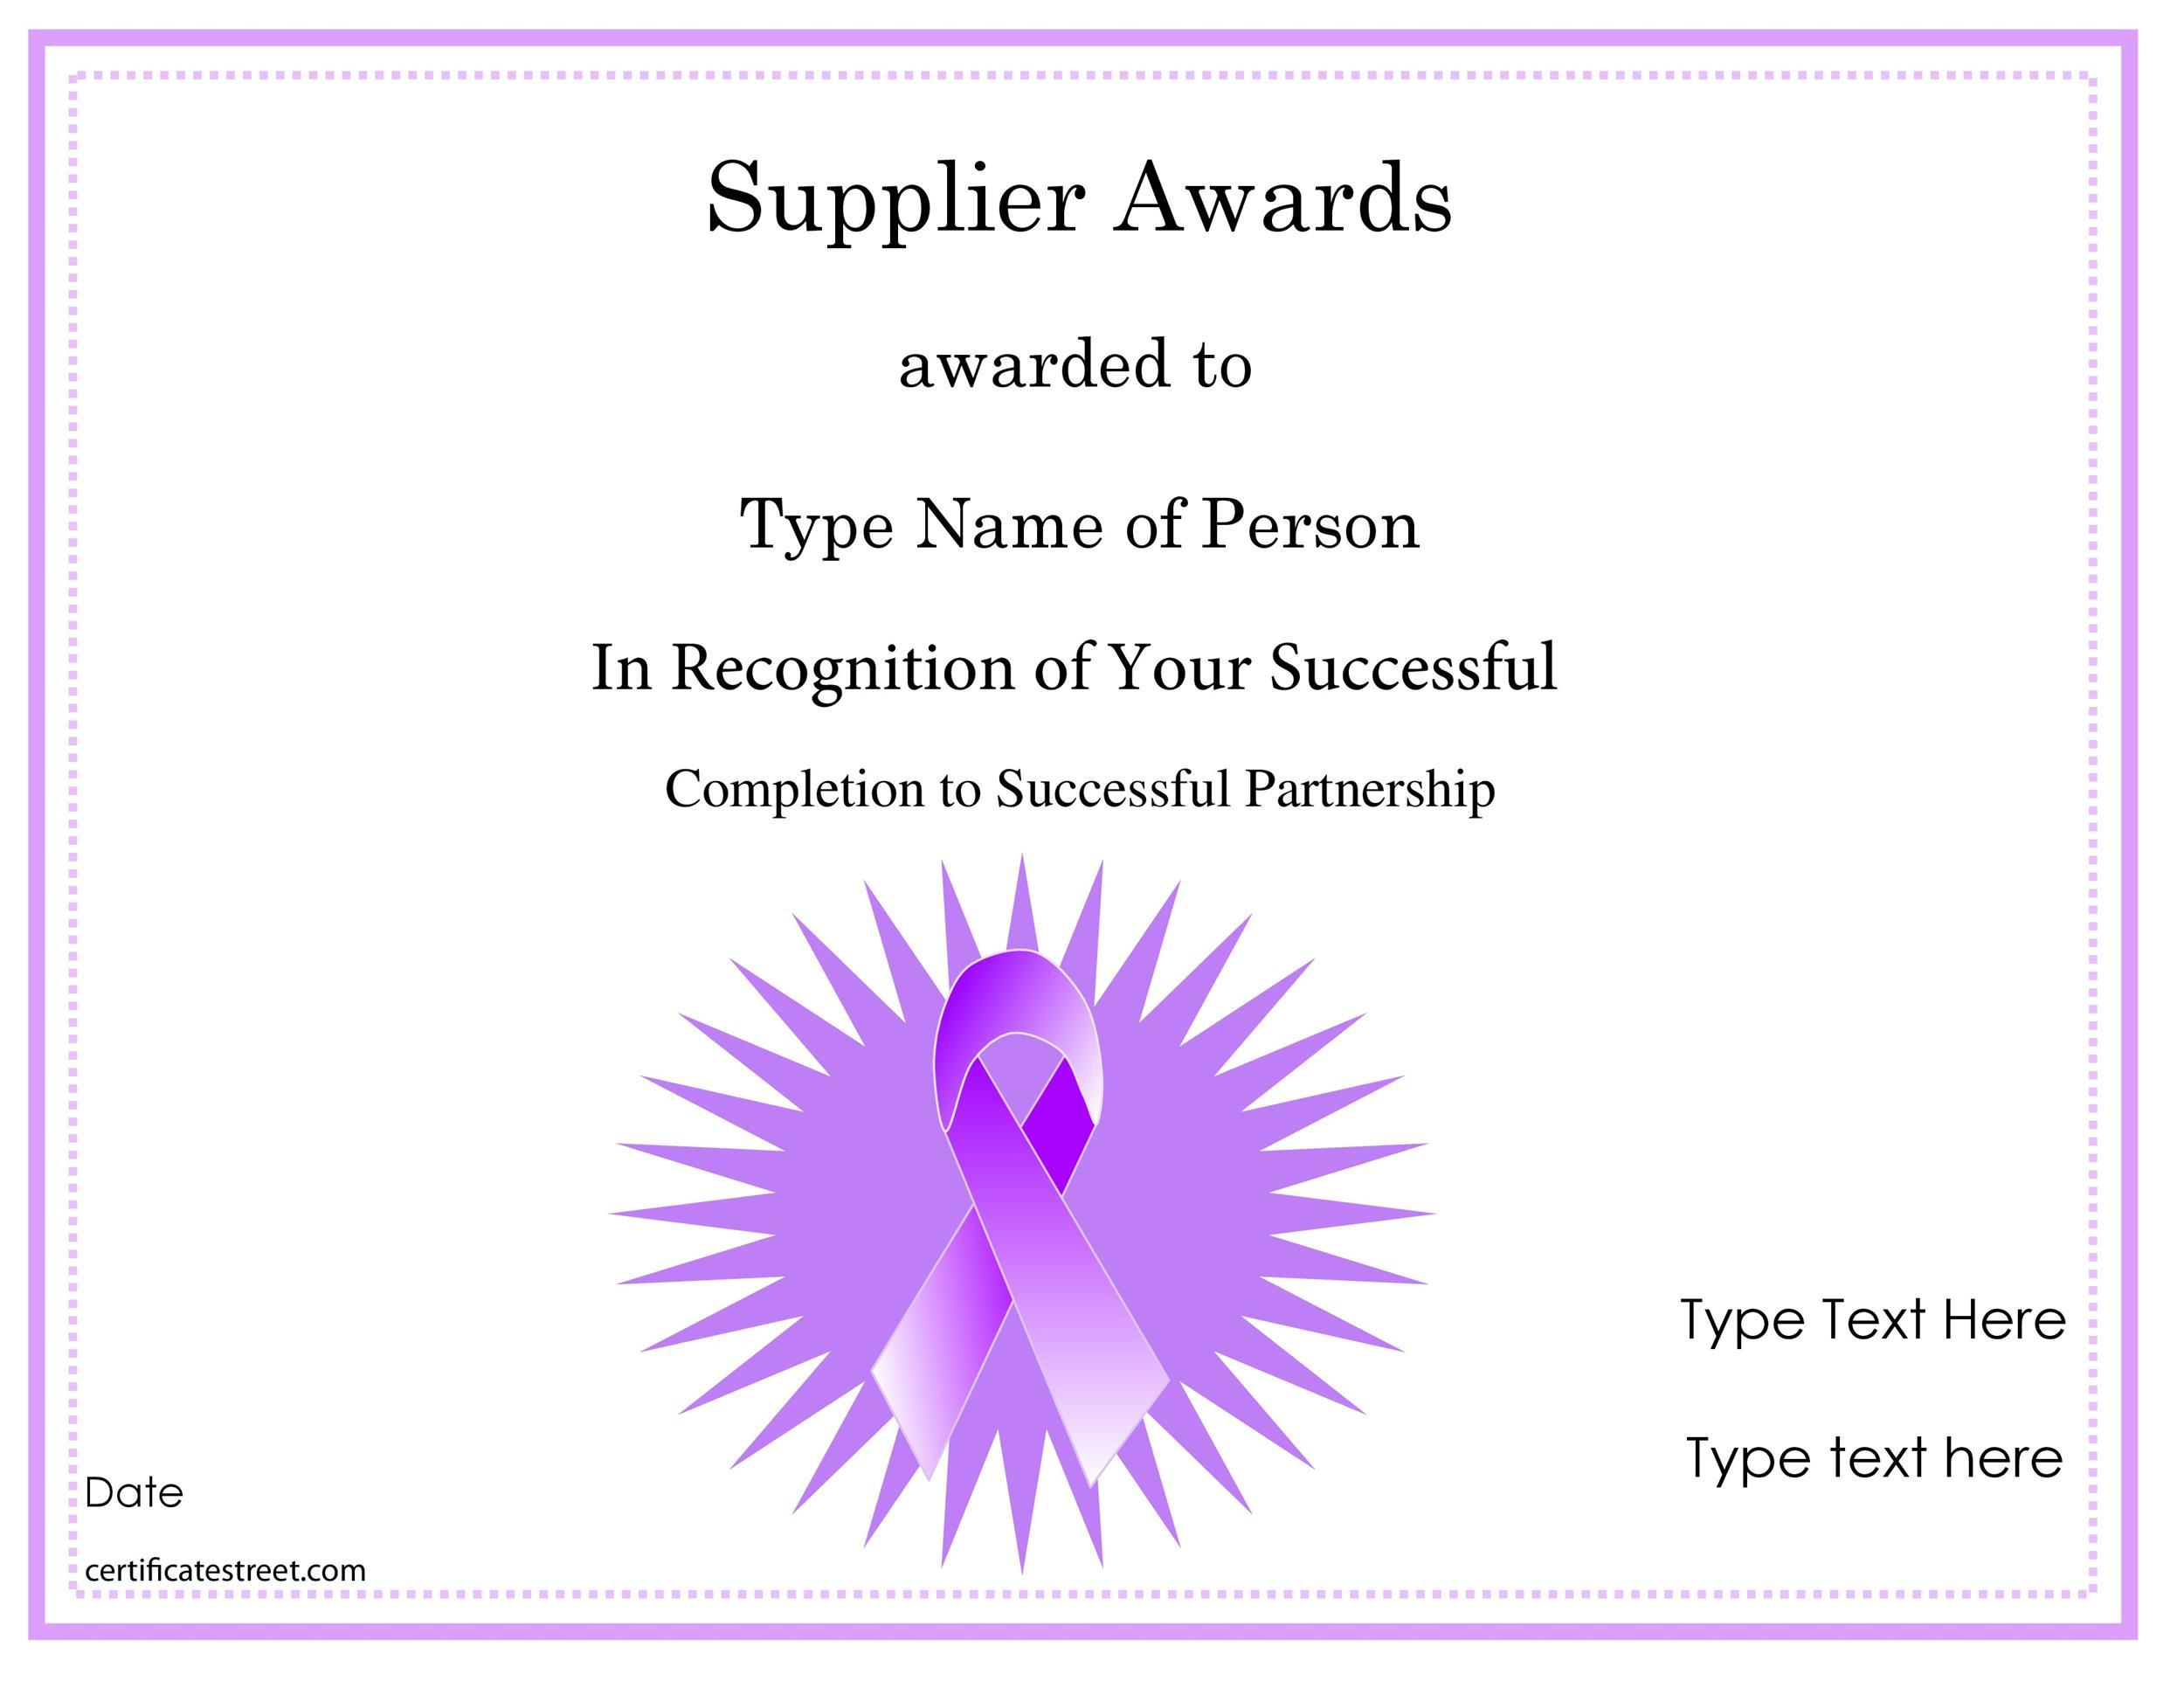 50 Amazing Award Certificate Templates - Template Lab - certificate of appreciation words